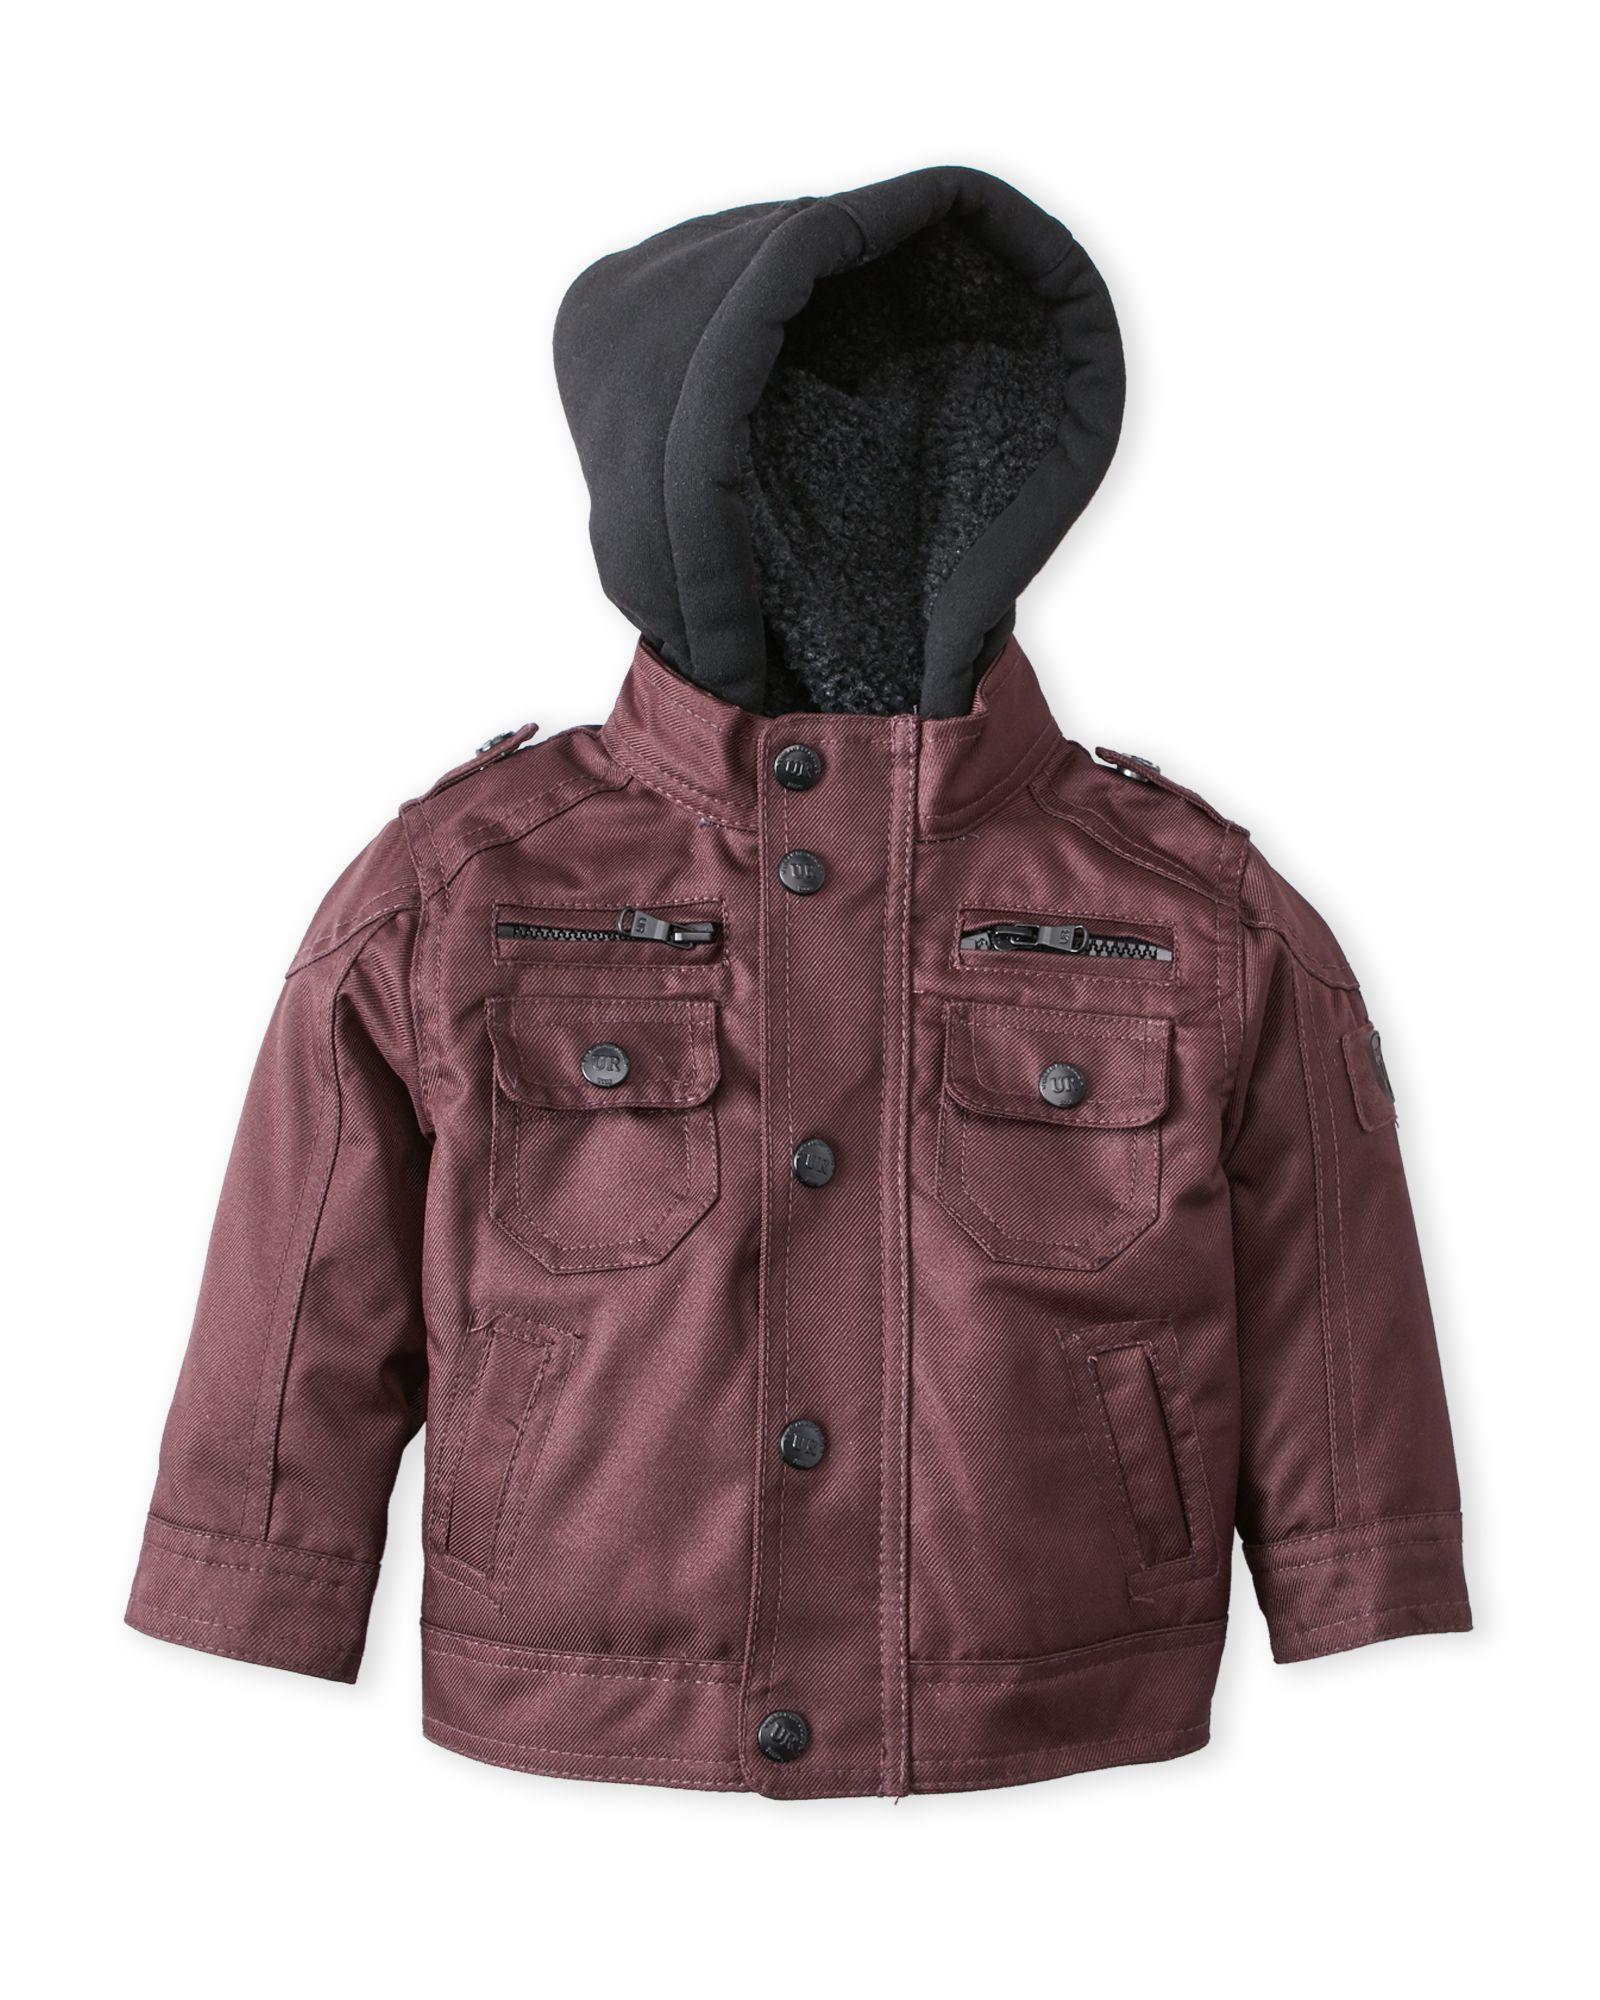 Urban Republic (Newborn/Infant Boys) Ballistic Officer Jacket